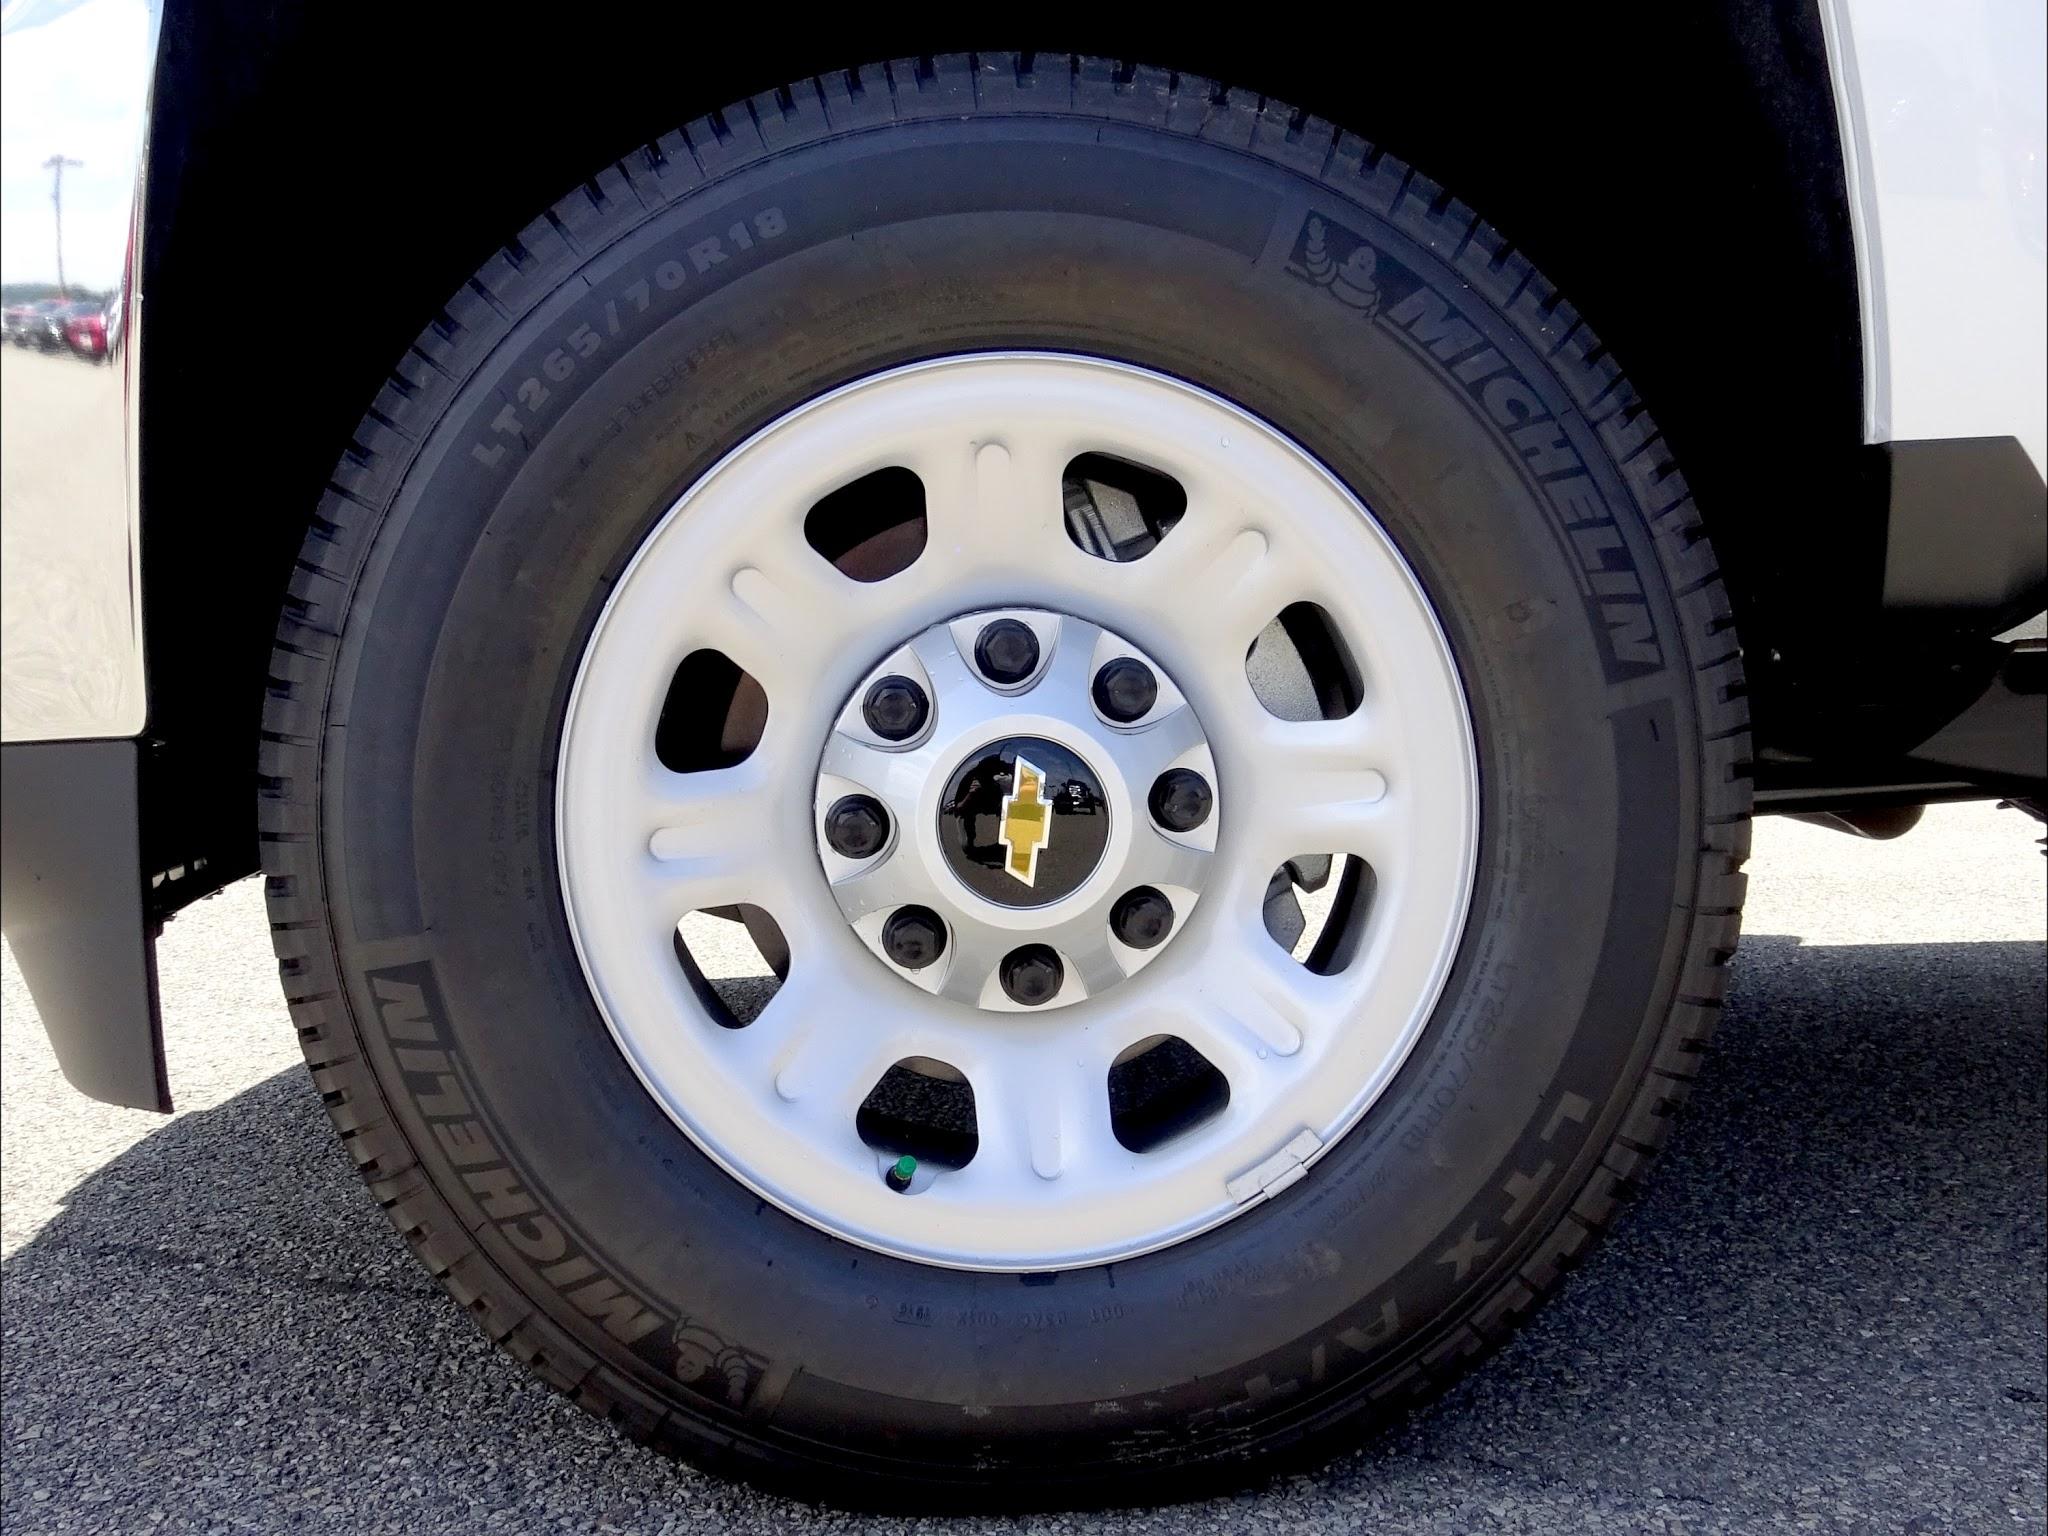 Album Google Gm Trailer Brake Wiring Photo 2016 Chevy Silverado 2500hd Regular Cab Long Box 4wd Work Truck Chevrolet